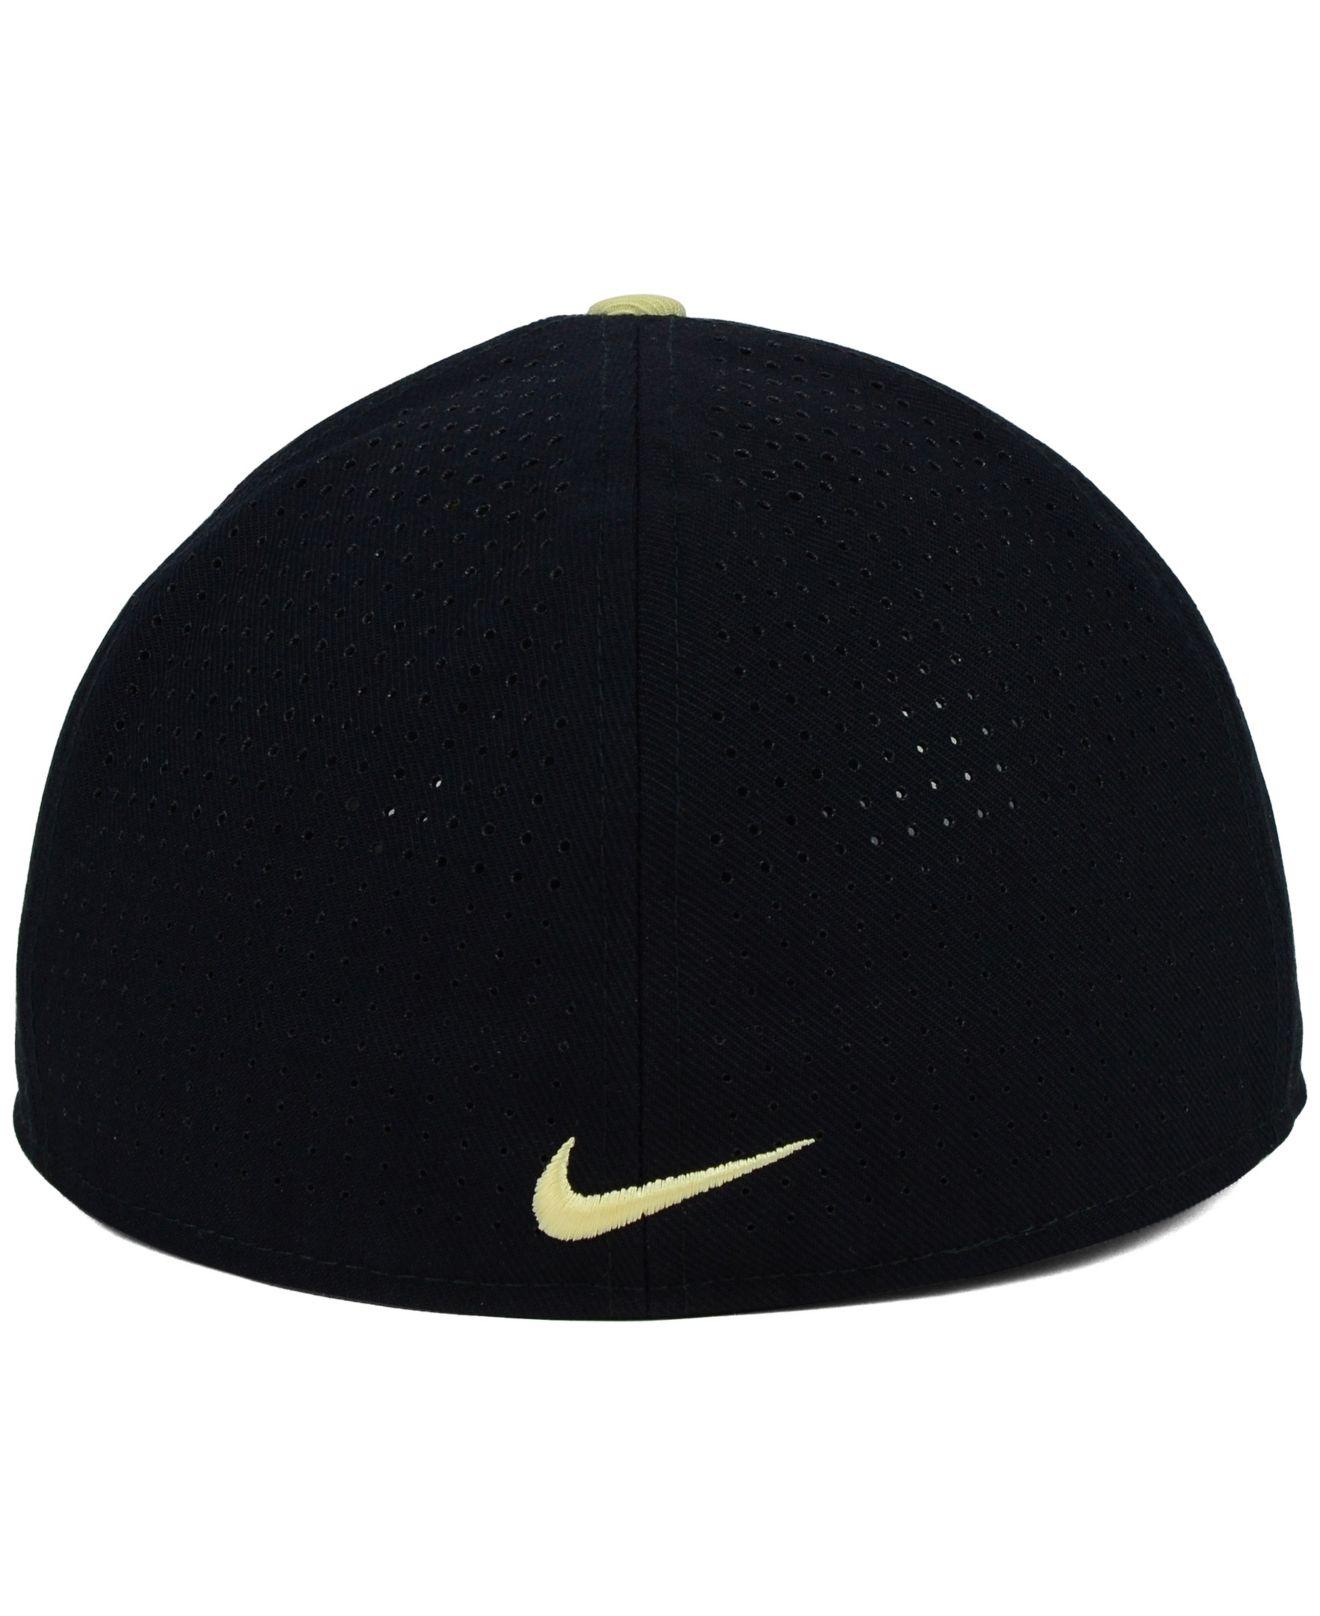 buy online 79f55 a4cb5 ... cheapest lyst nike vanderbilt commodores authentic vapor cap in black  for men 25c7e d8df9